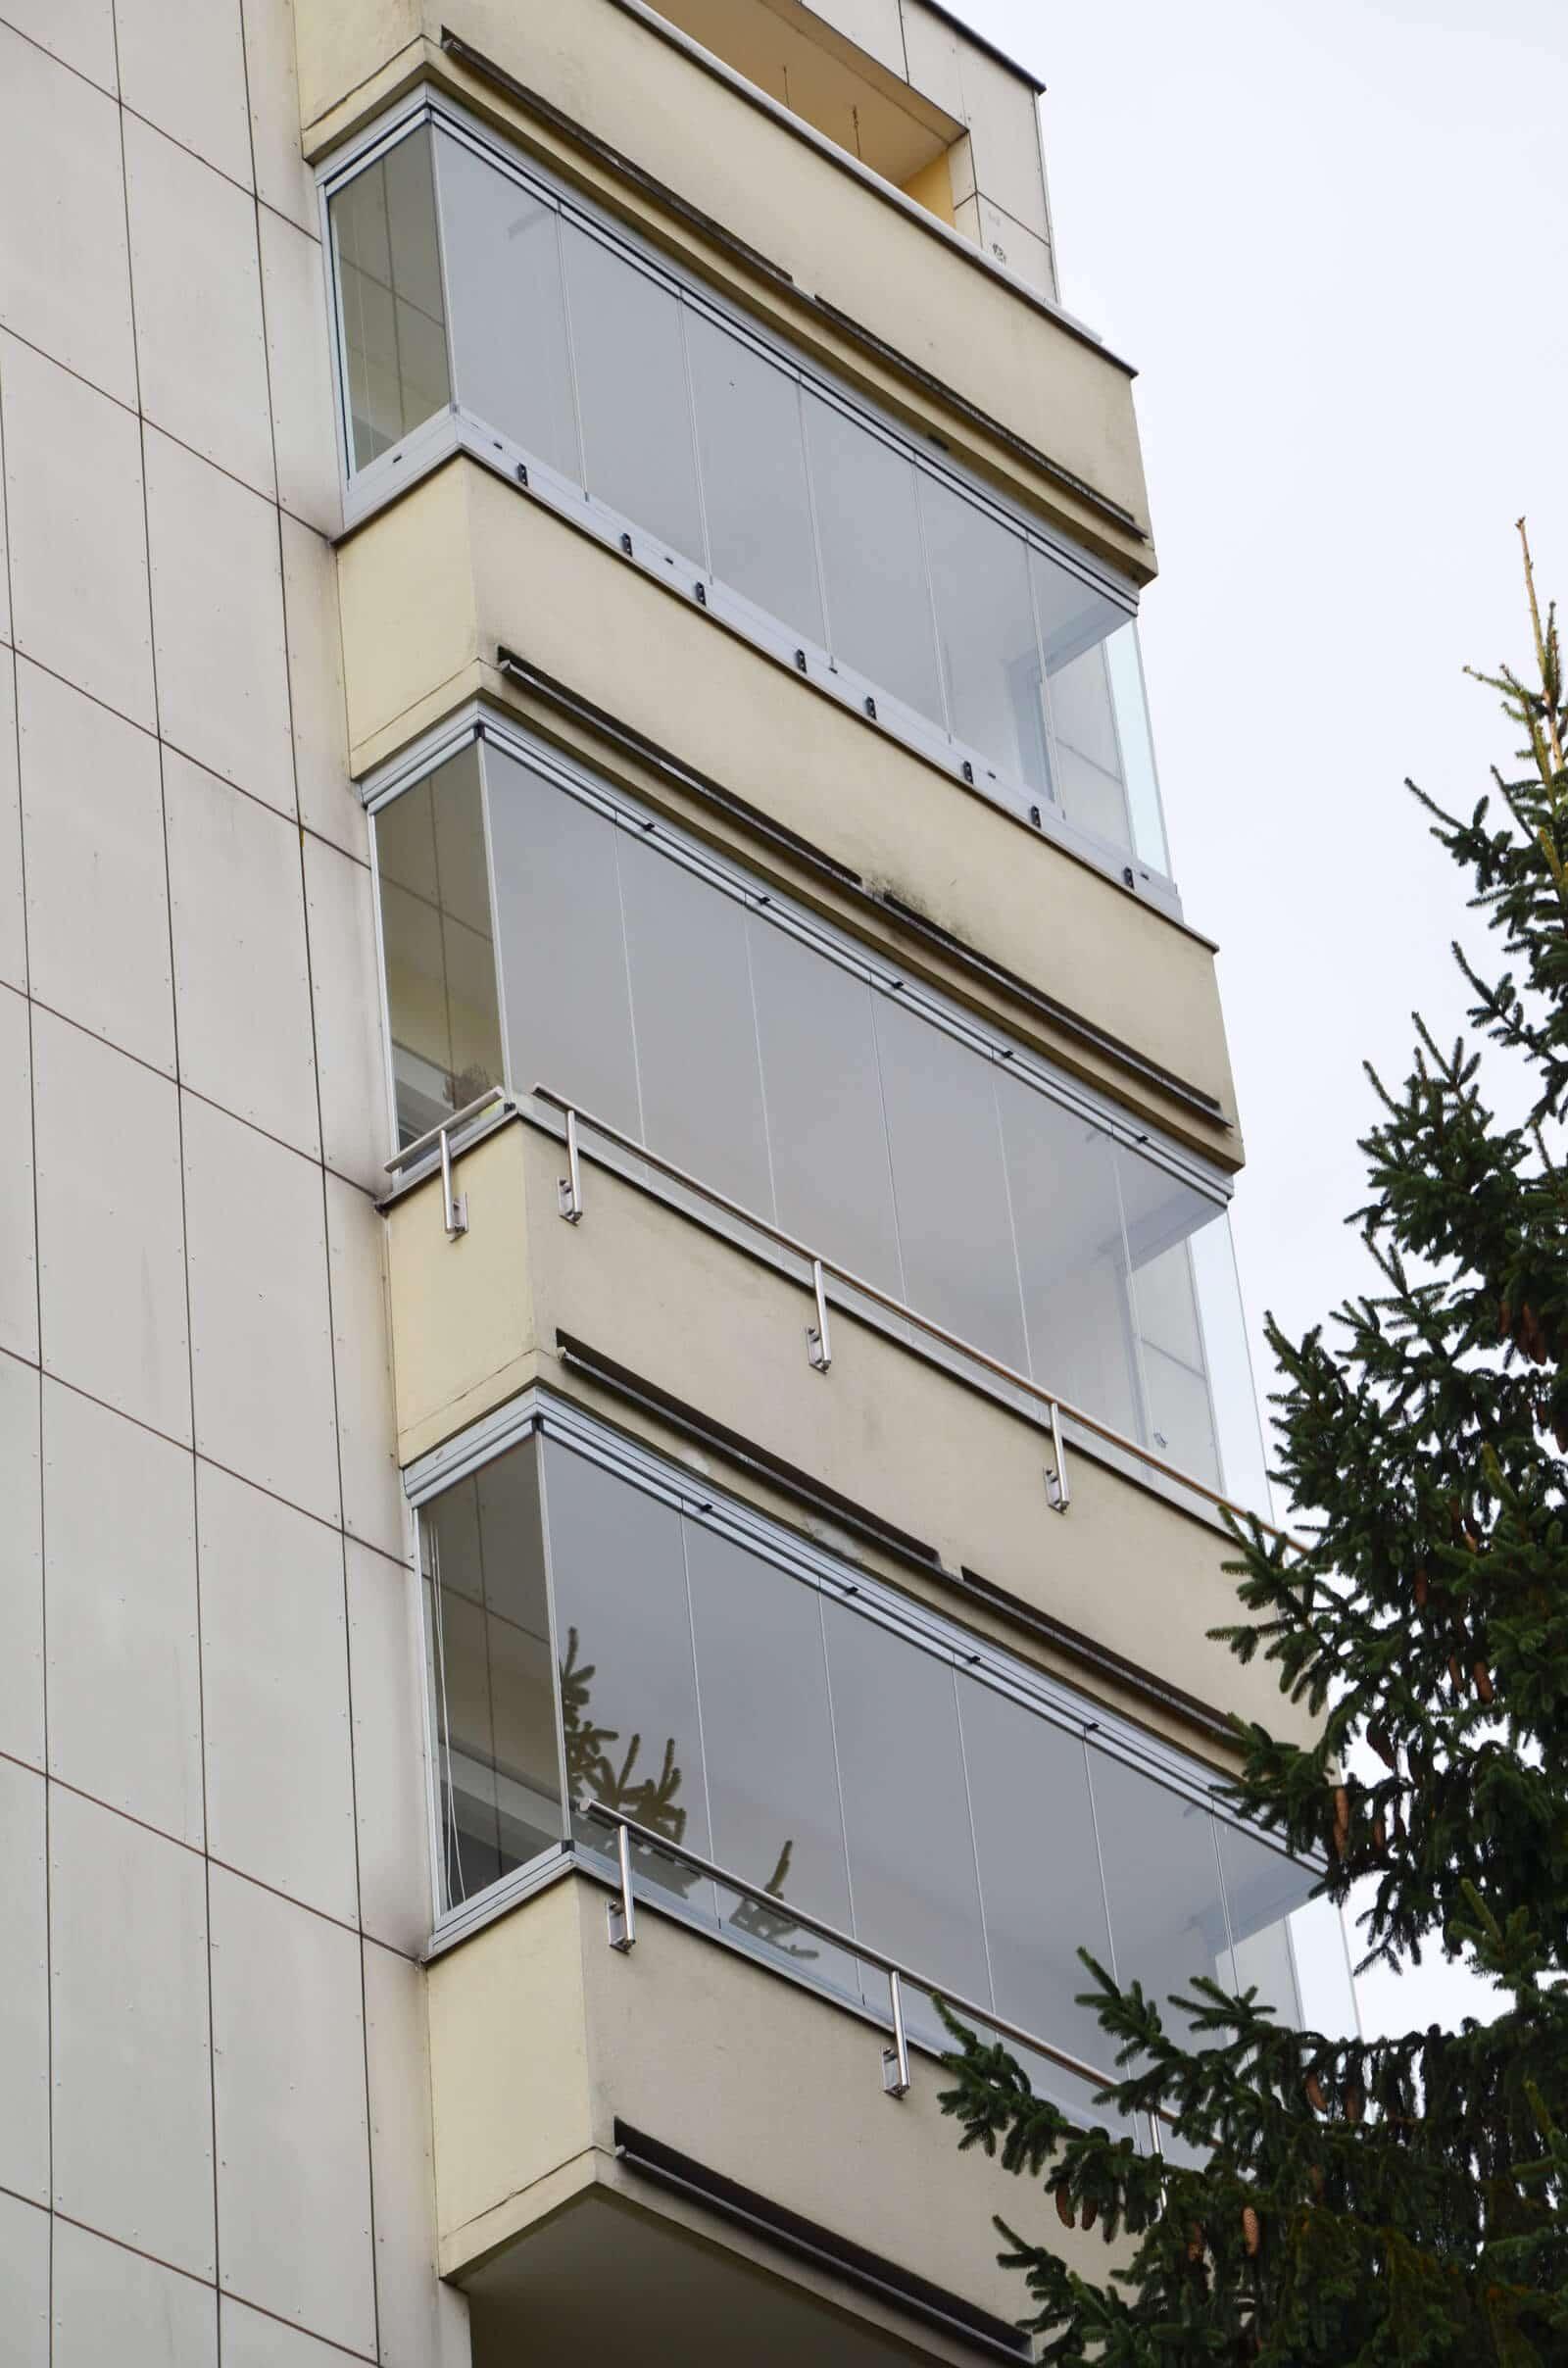 Balkon Fenster faltbar